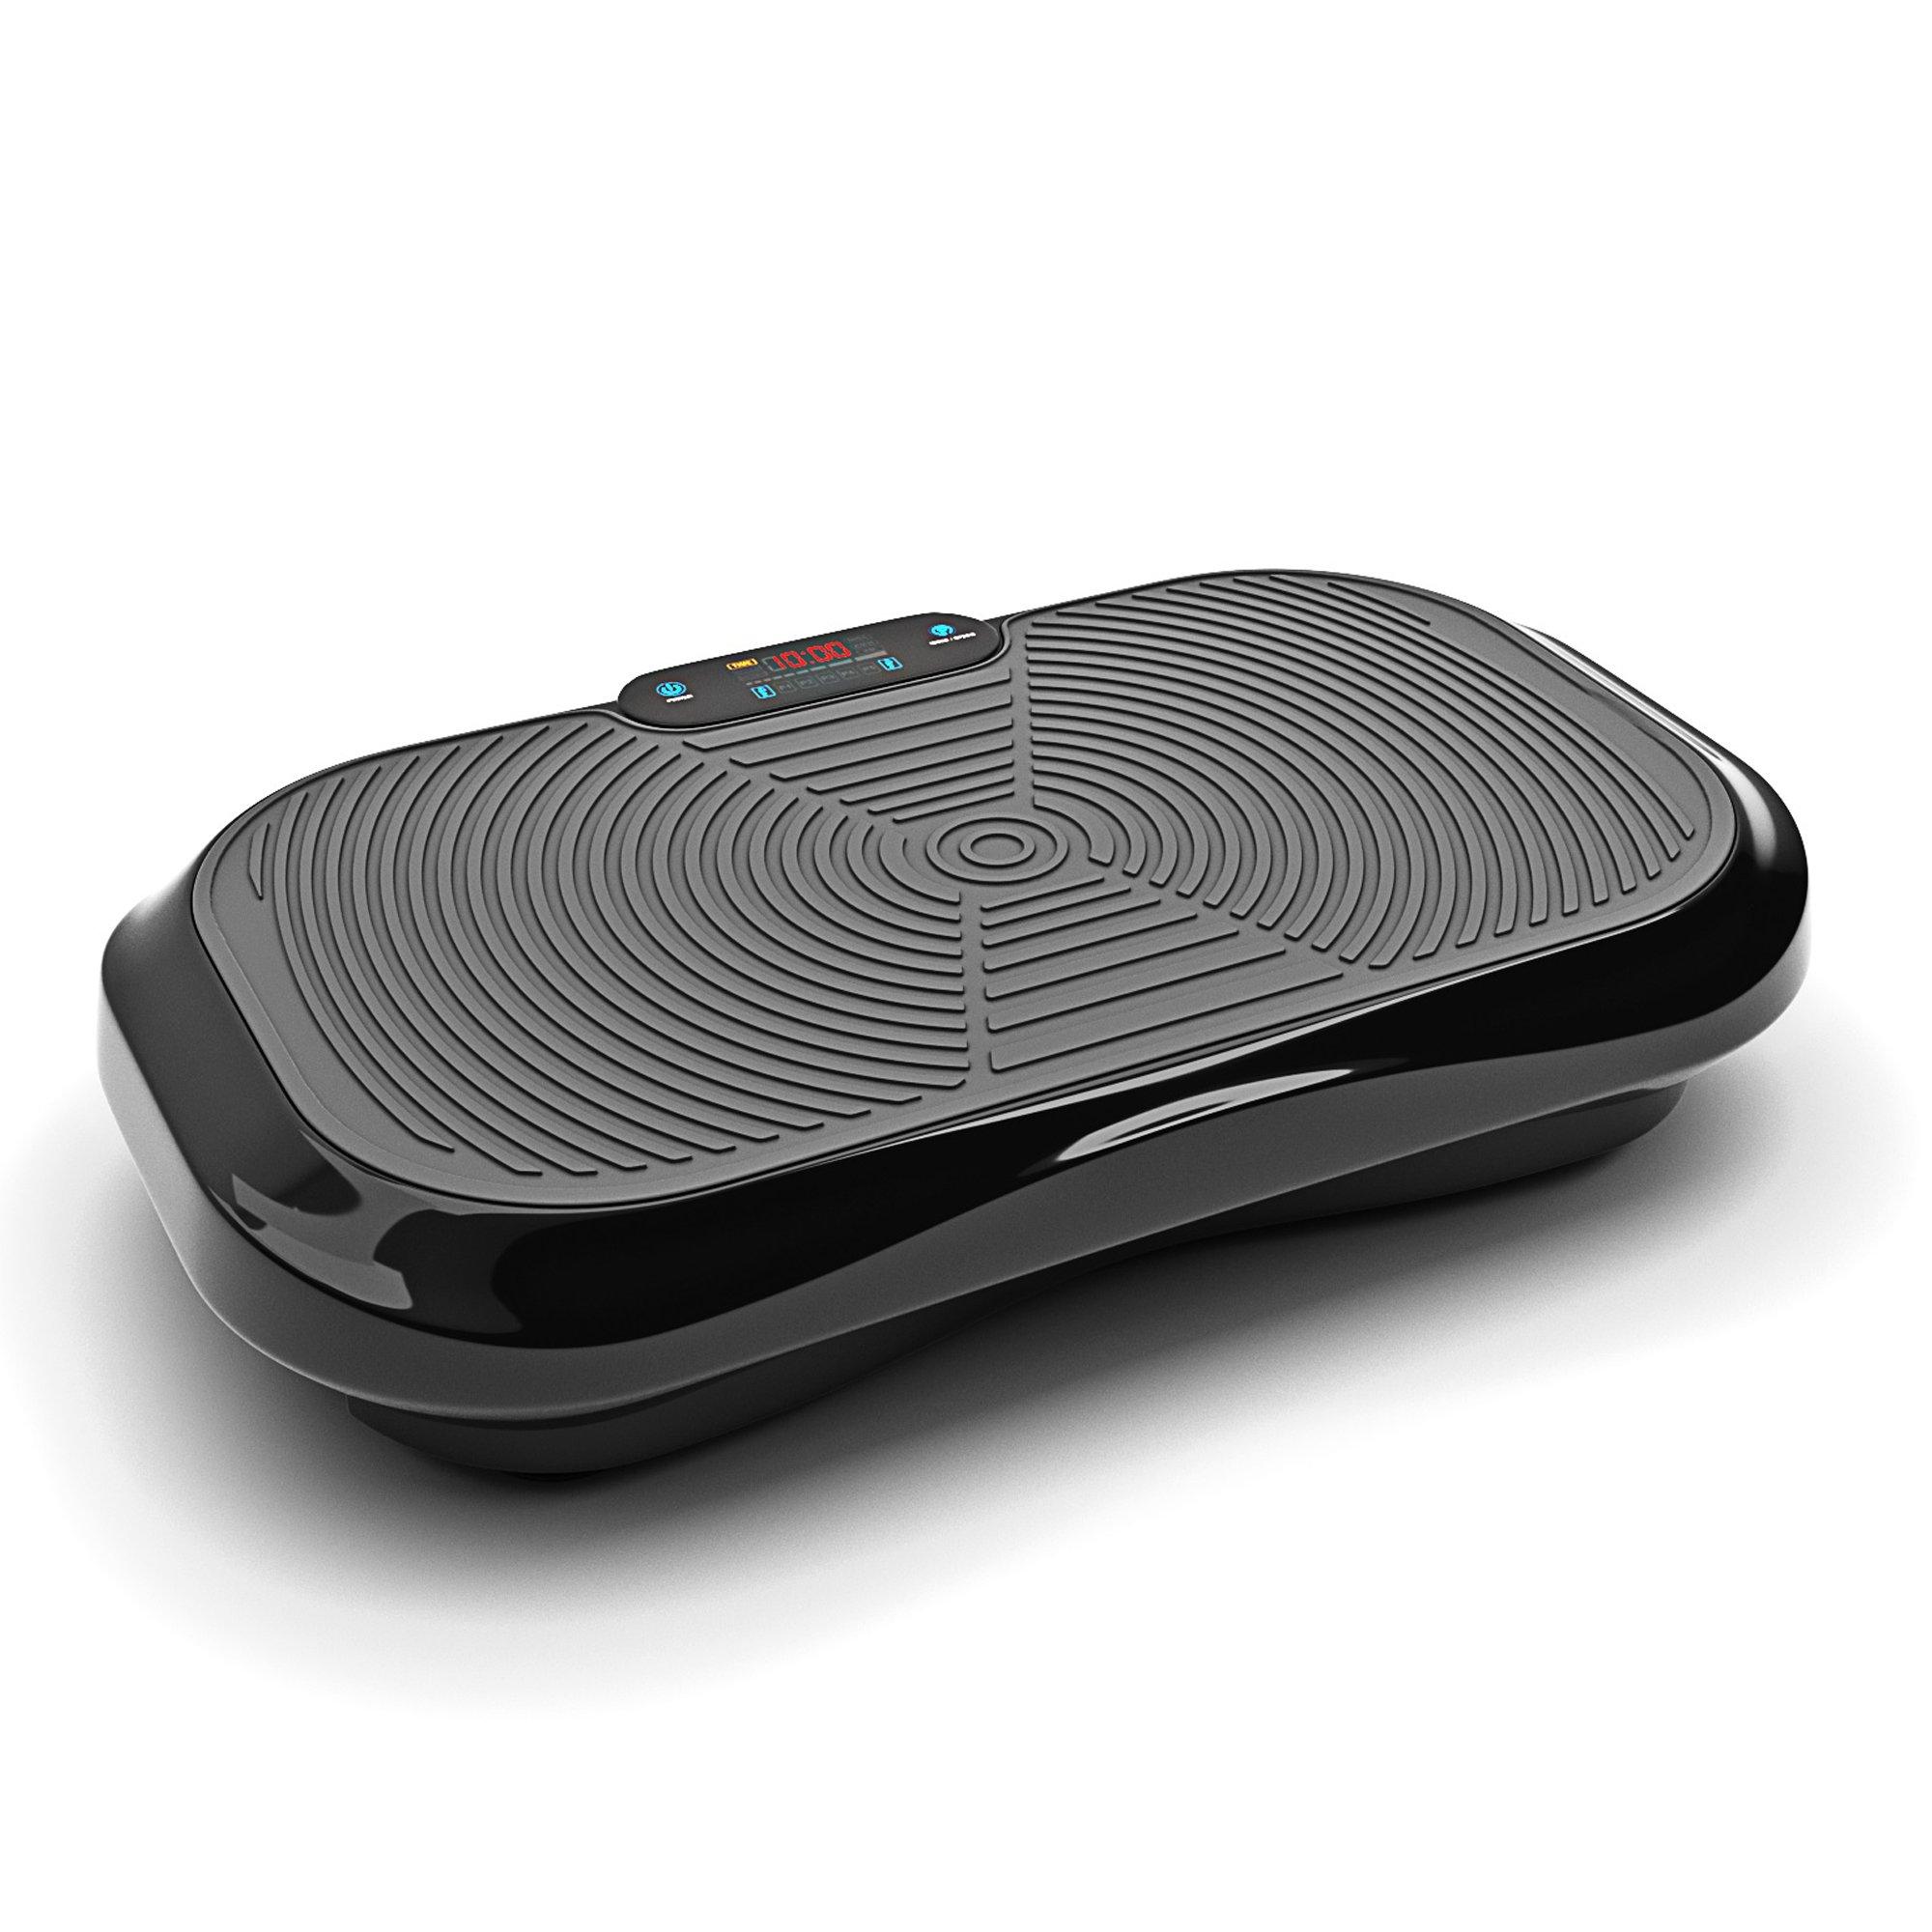 479ad1aa7d Bluefin Fitness Vibration Platform